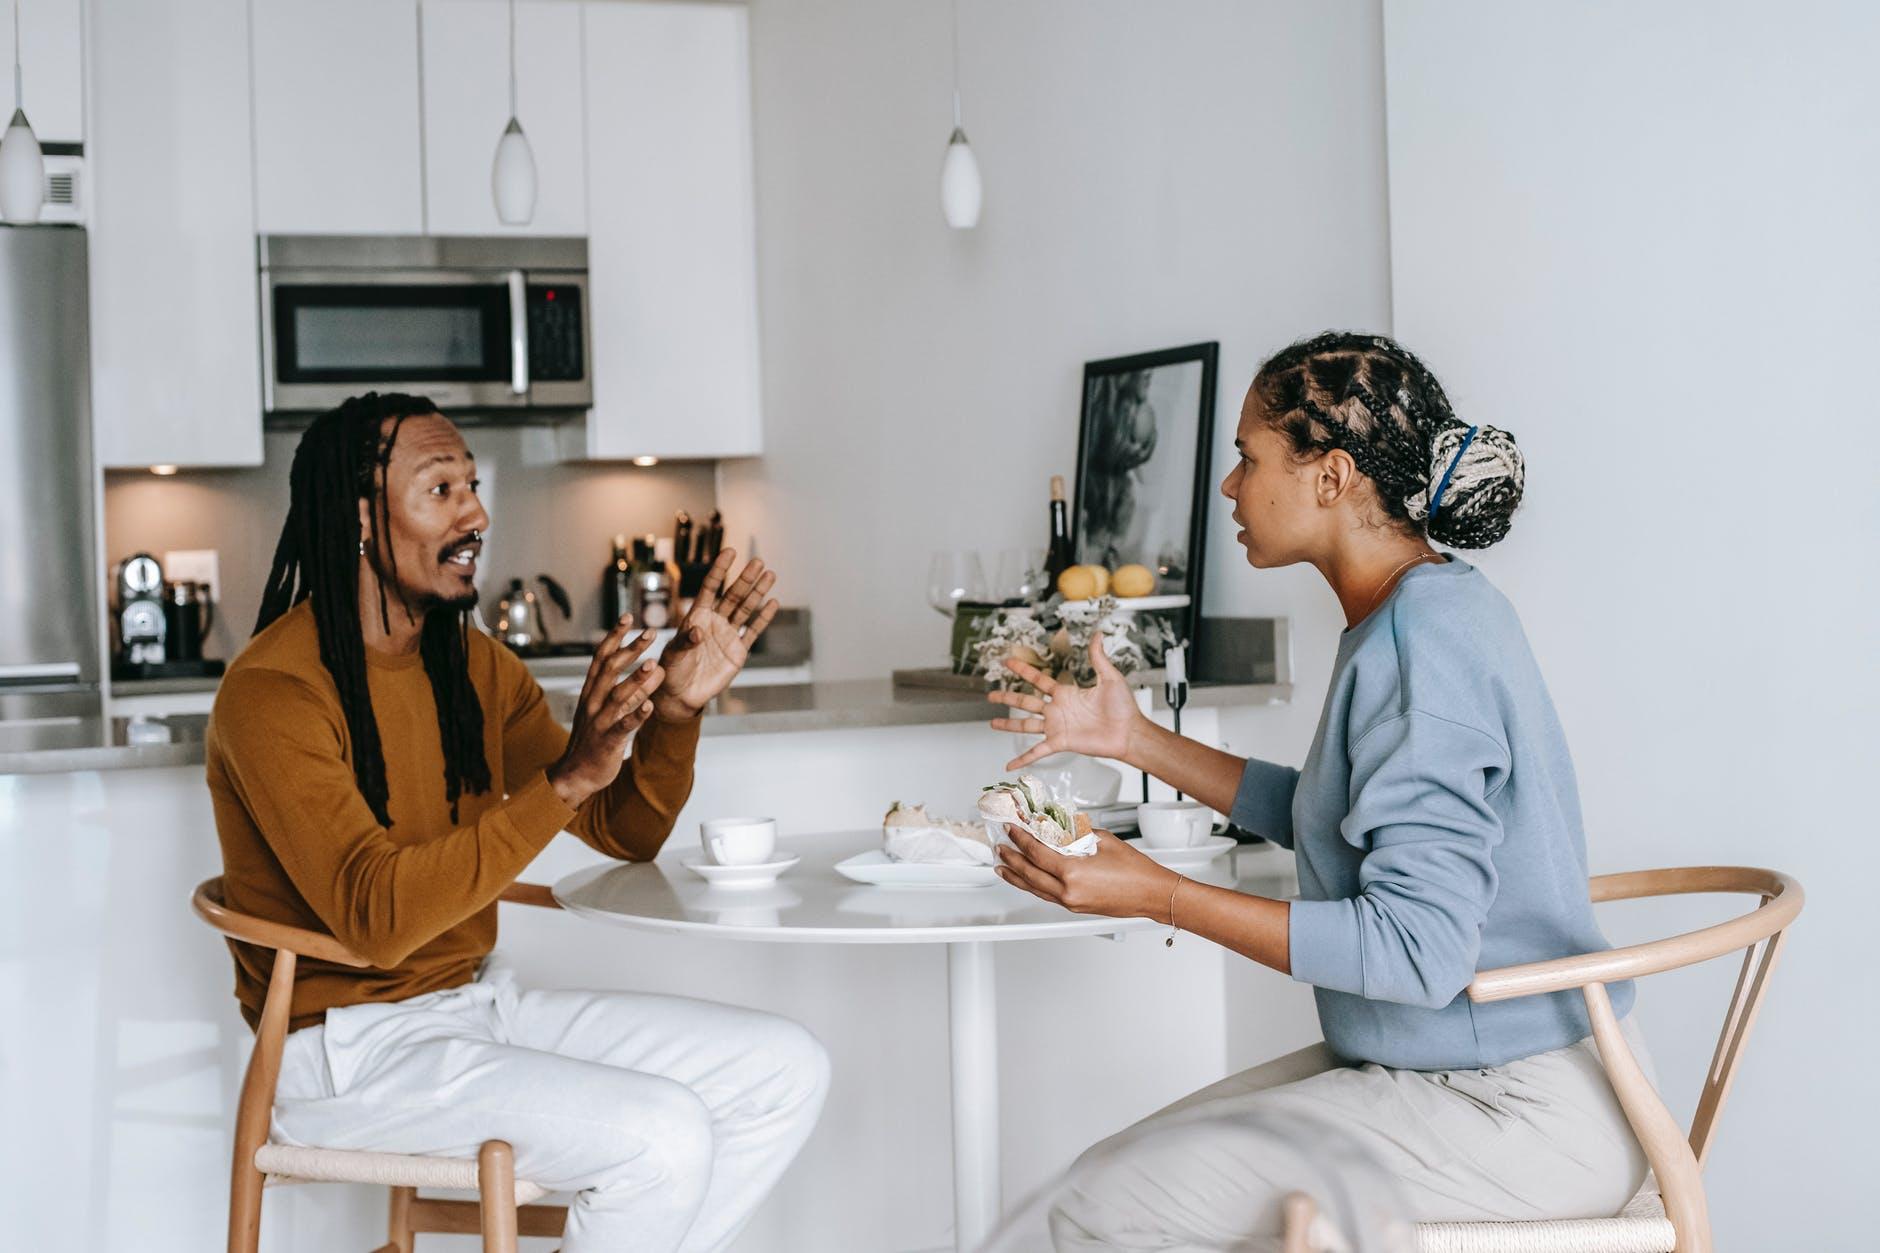 ethnic couple quarrelling in kitchen